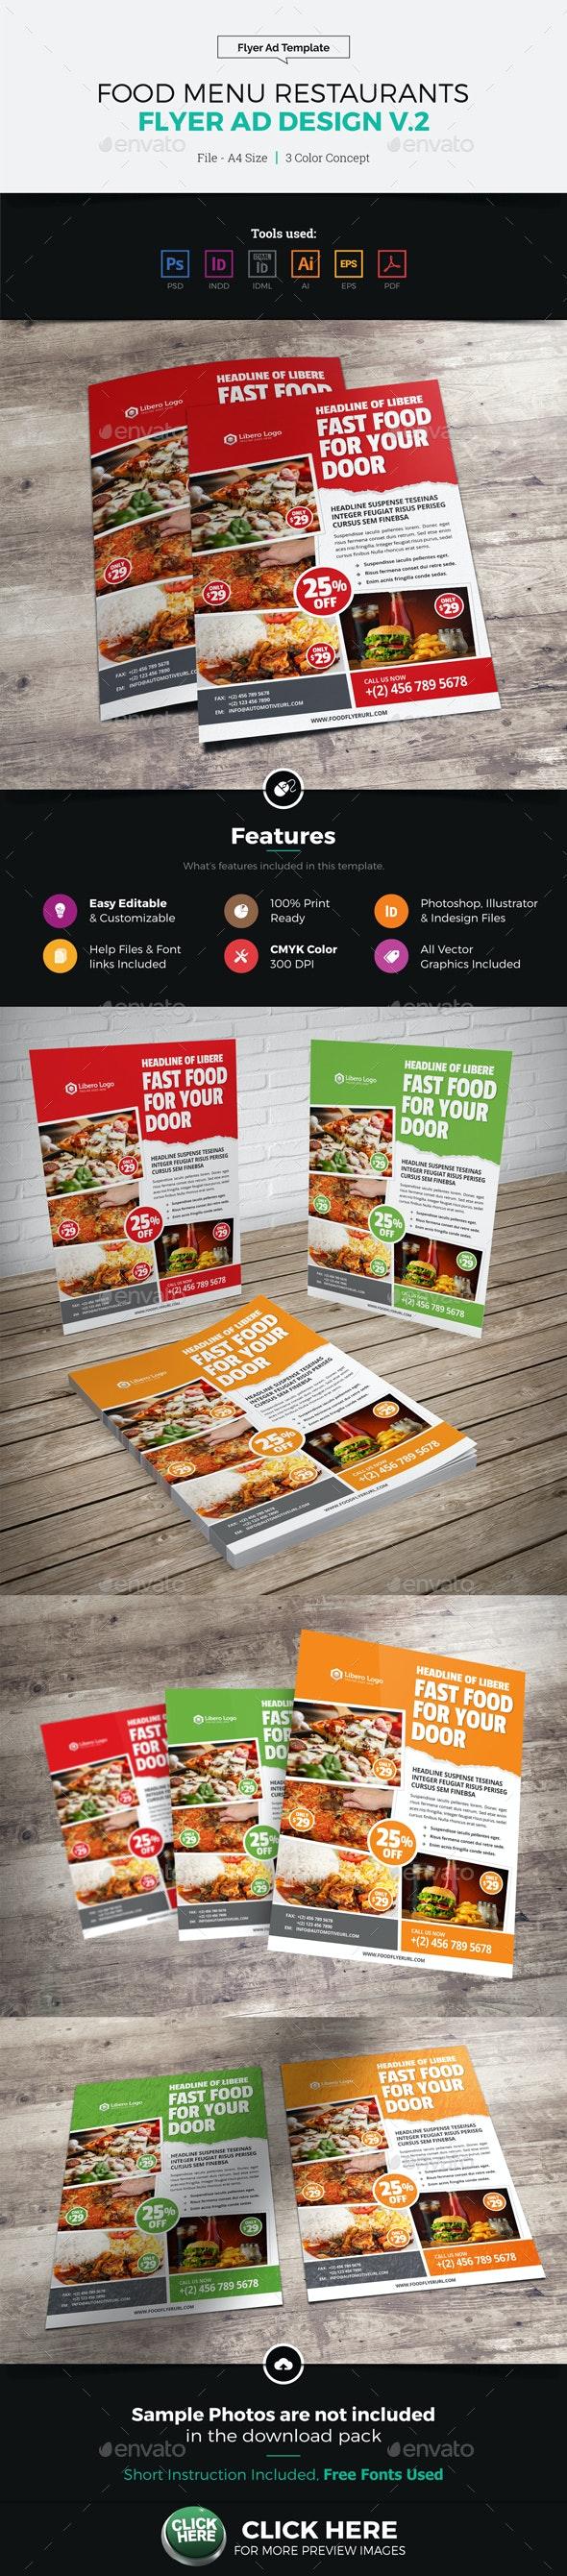 Food Menu Restaurants Flyer Ad Design v2 - Restaurant Flyers